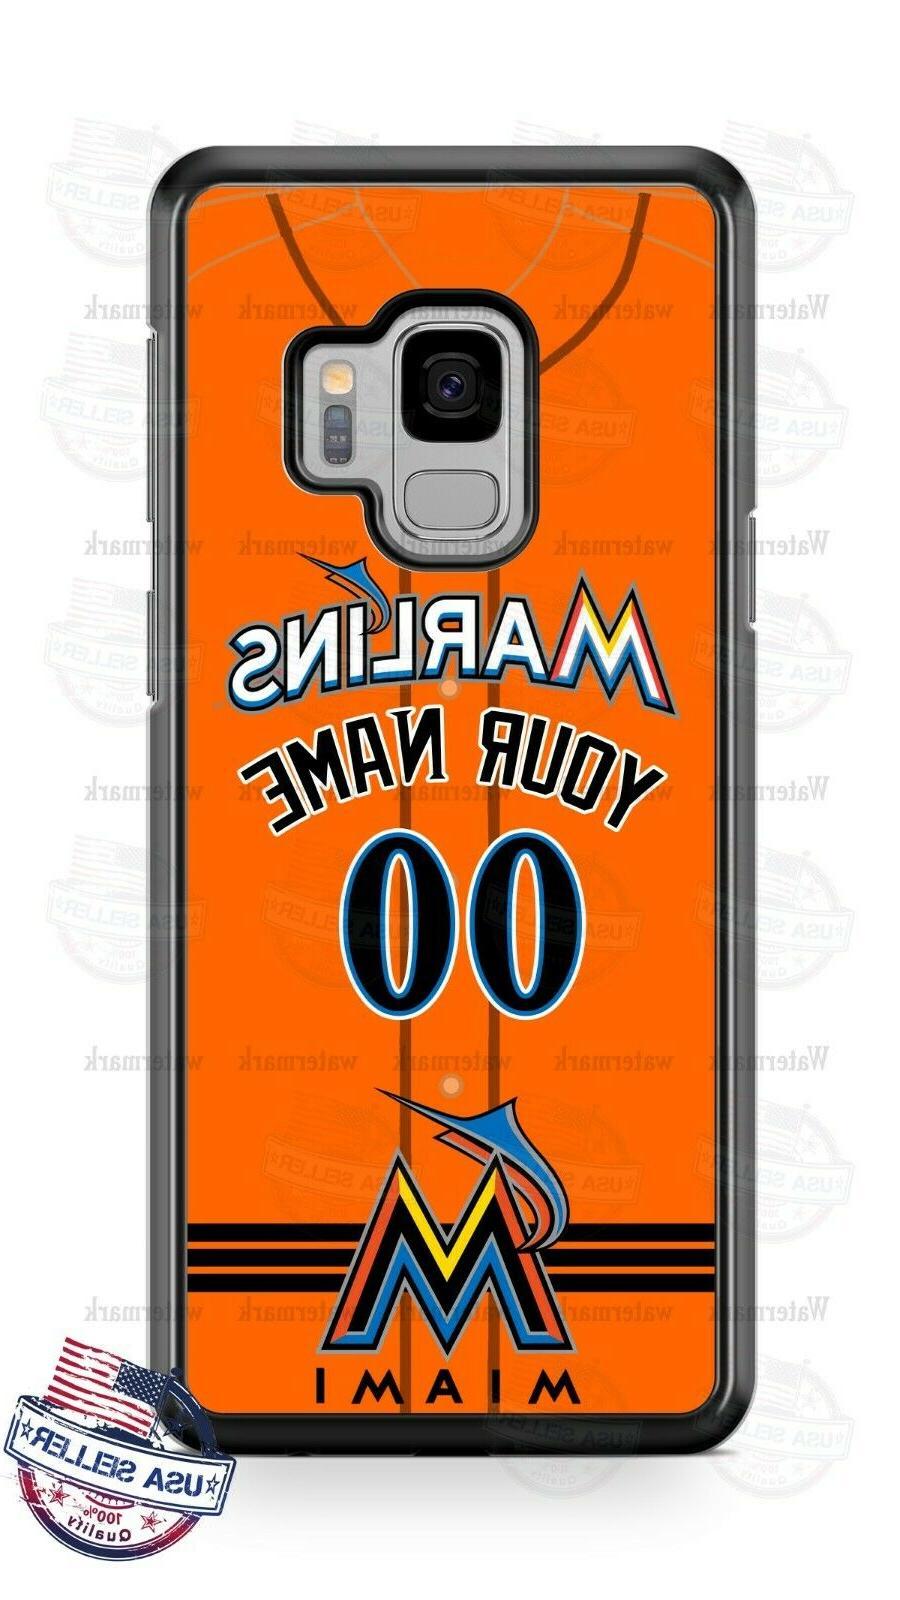 MIAMI BASEBALL PHONE FOR SAMSUNG LG